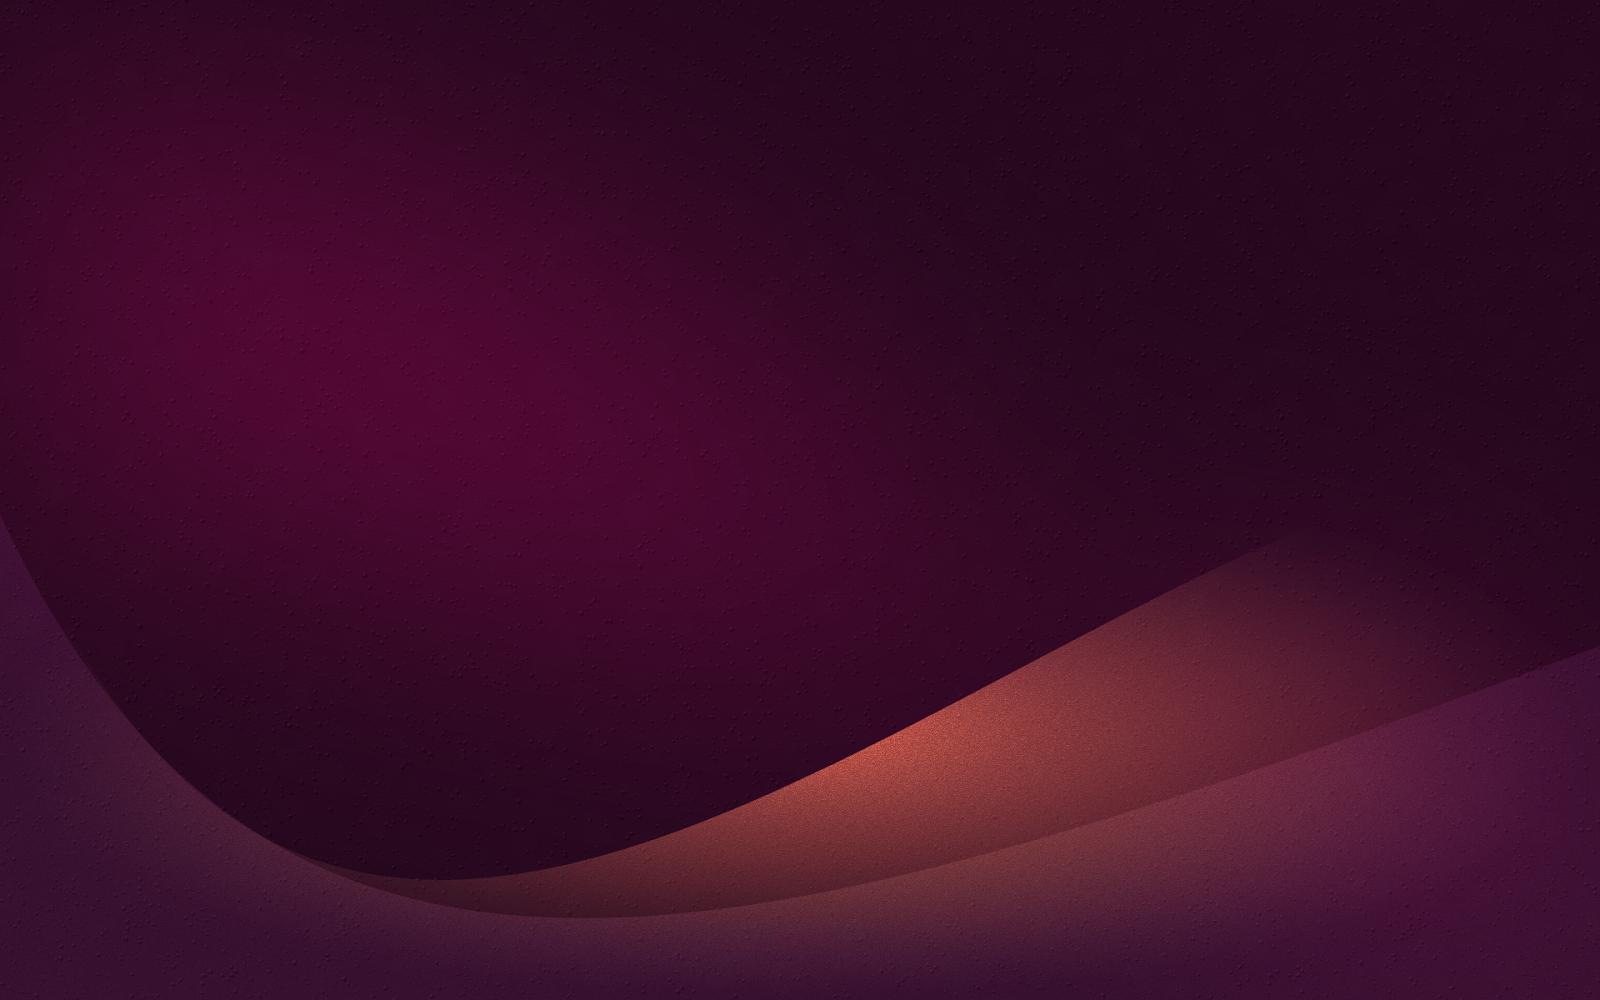 Linux Wallpaper ubuntu linux wallpaper 1600x1000